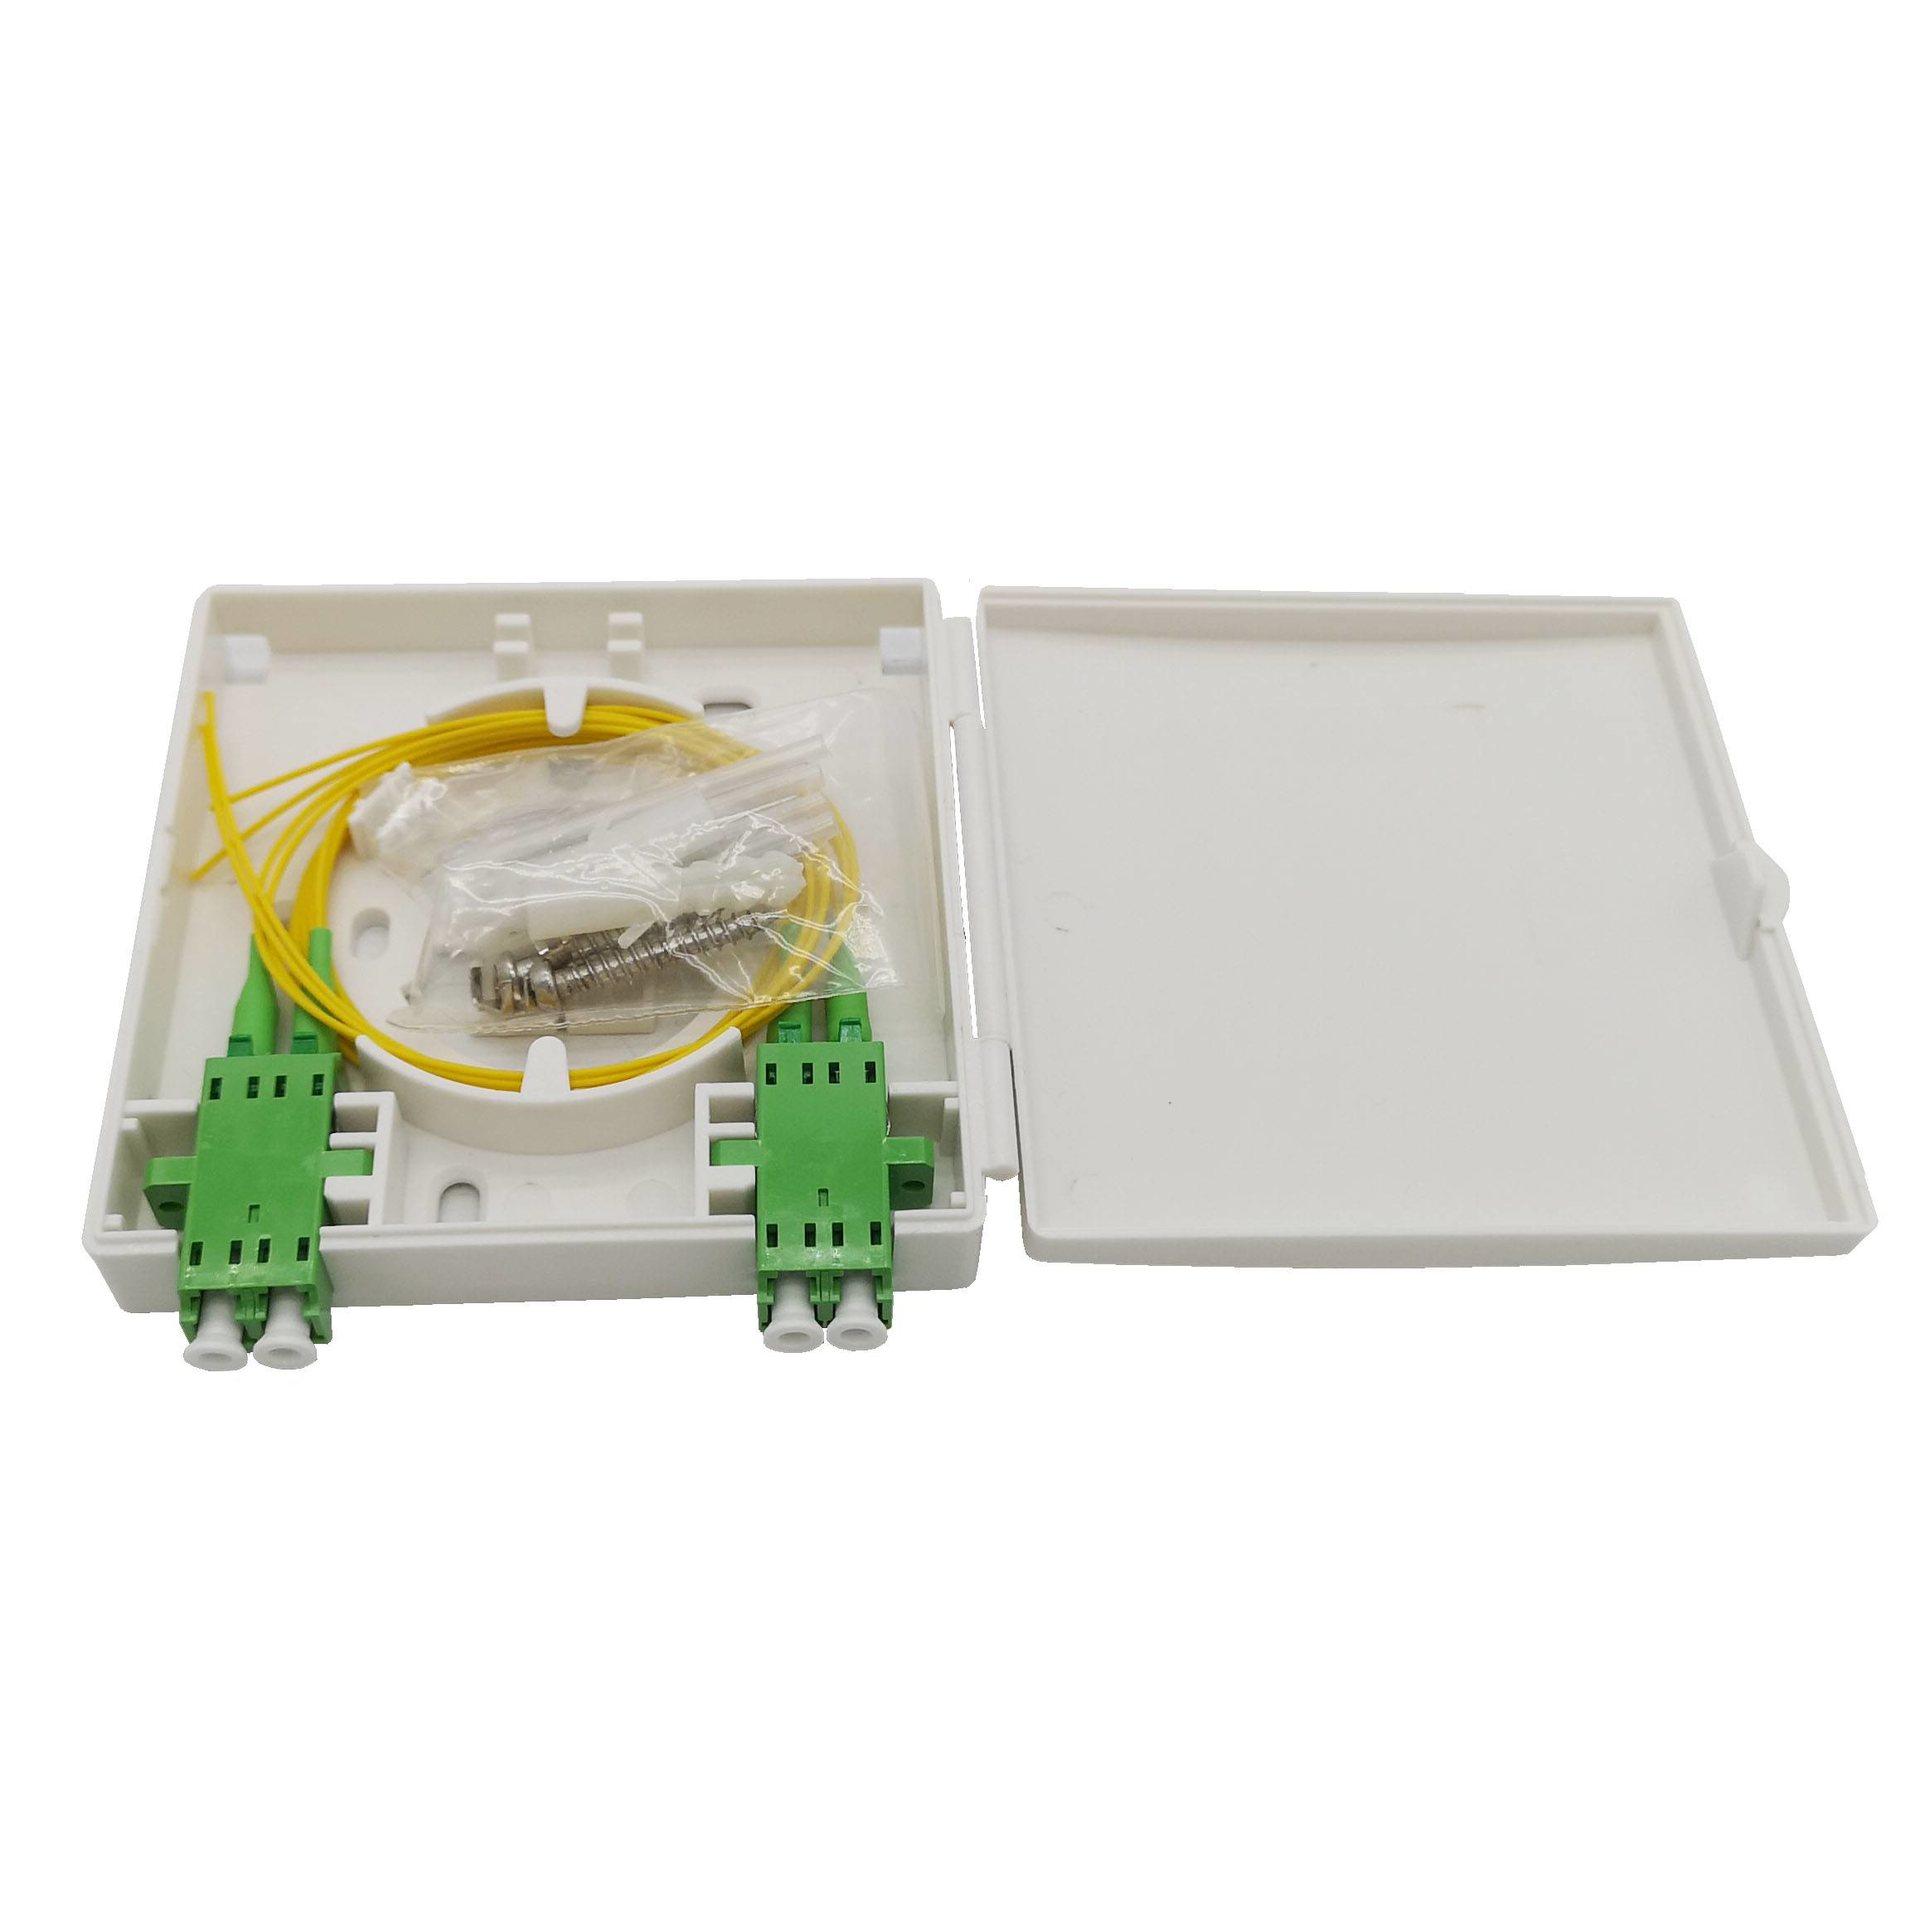 FTB86A 2 ports fiber optic wall socket box